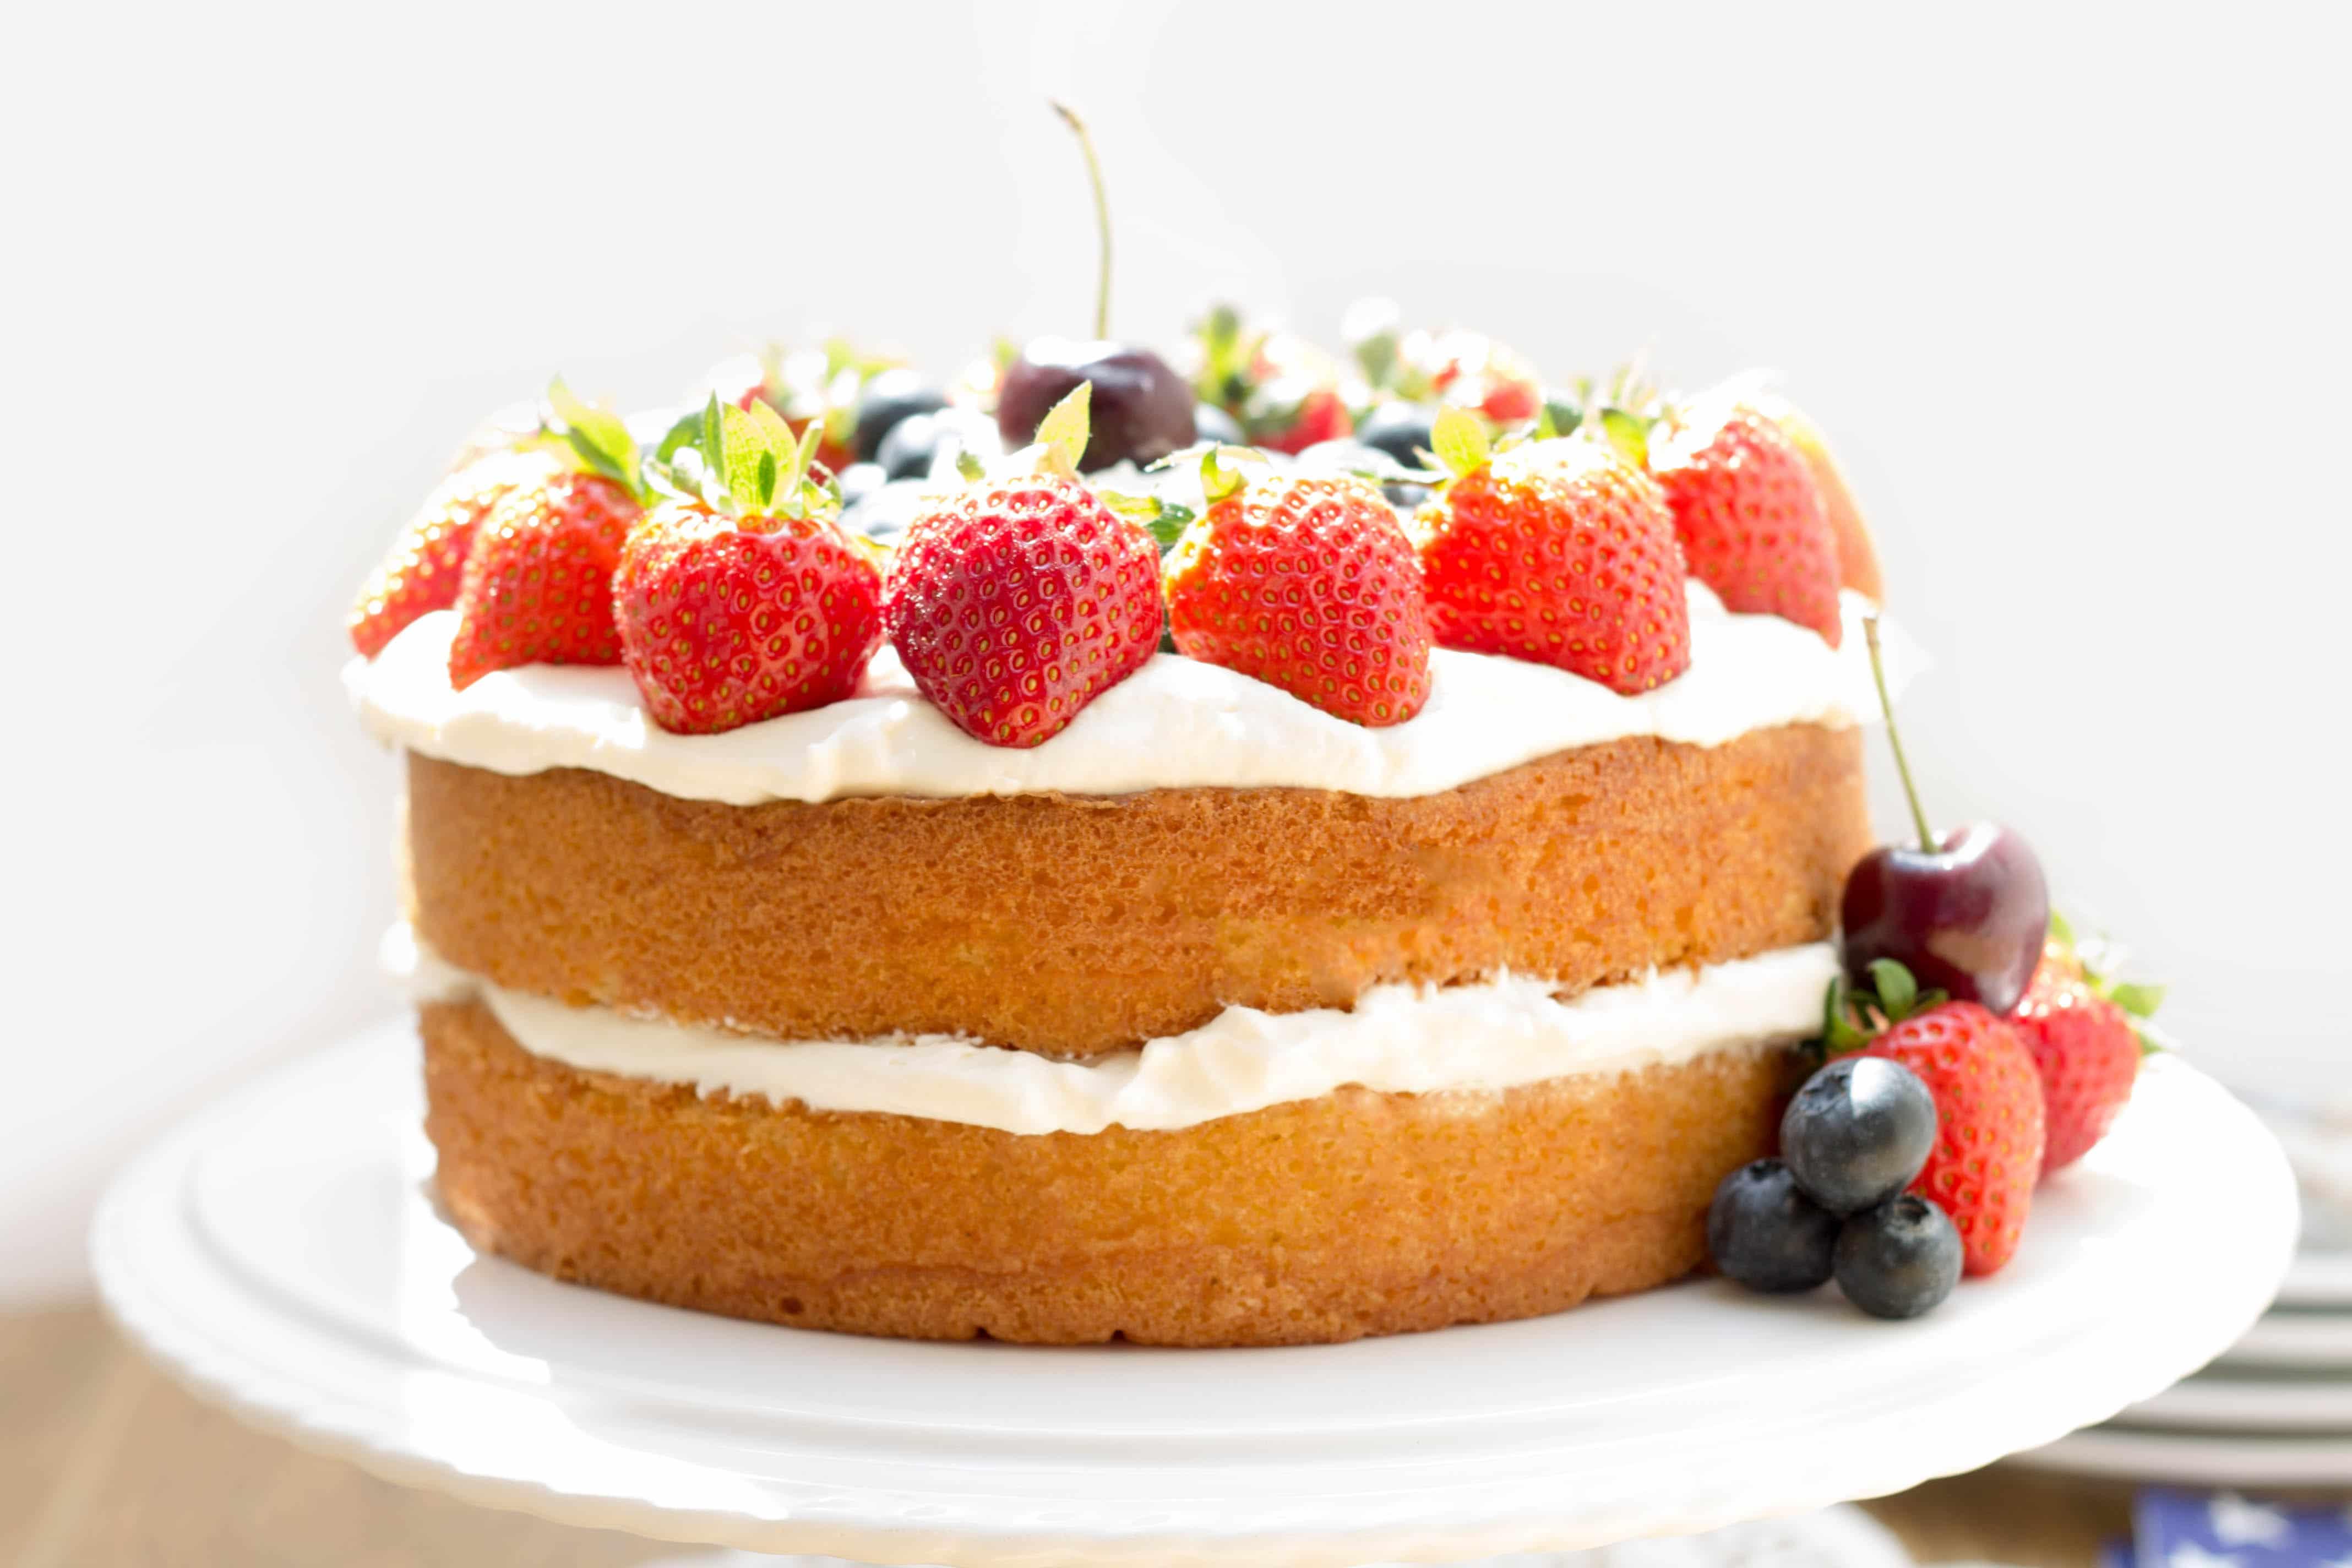 Homemade Cake Decoration Without Cream : Patriotic Vanilla Cream Sponge Cake - Red white and blue ...